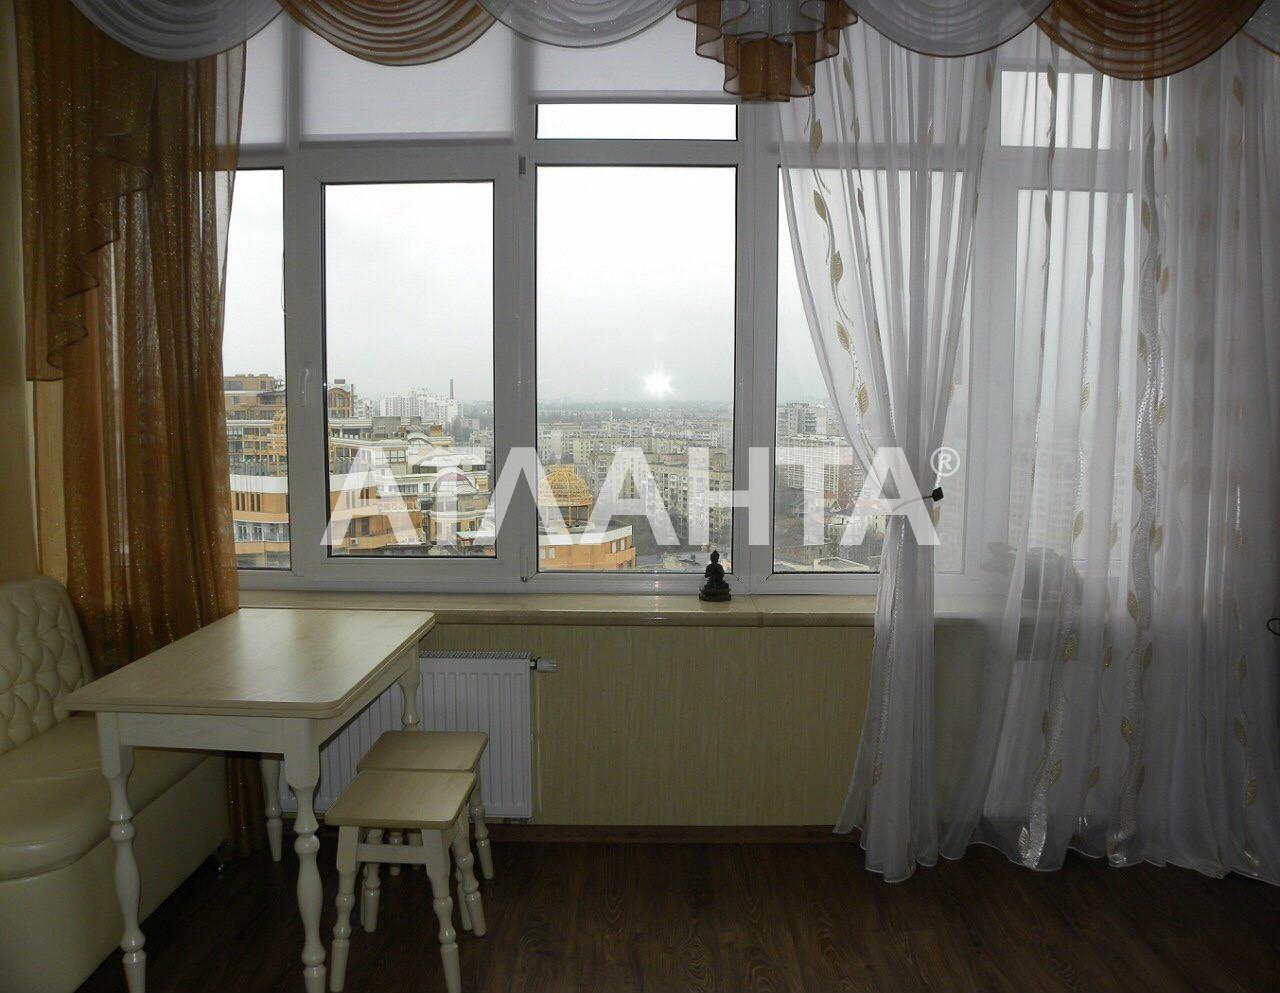 Продается 1-комнатная Квартира на ул. Генуэзская — 69 000 у.е. (фото №2)